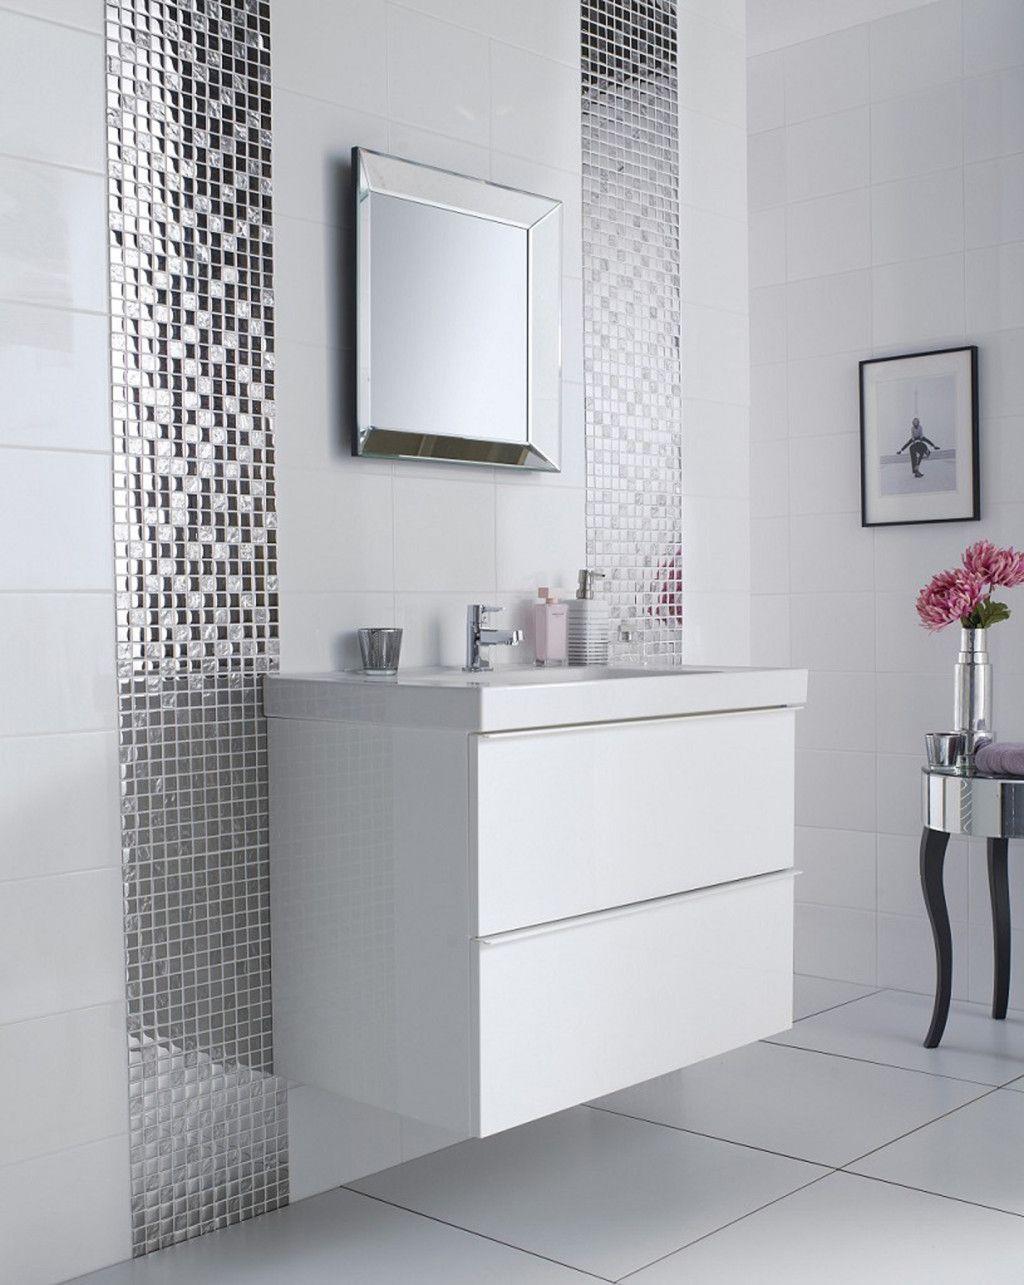 Bathroom: Enchanting Mirrored Tile Backsplash For Modern Home ...